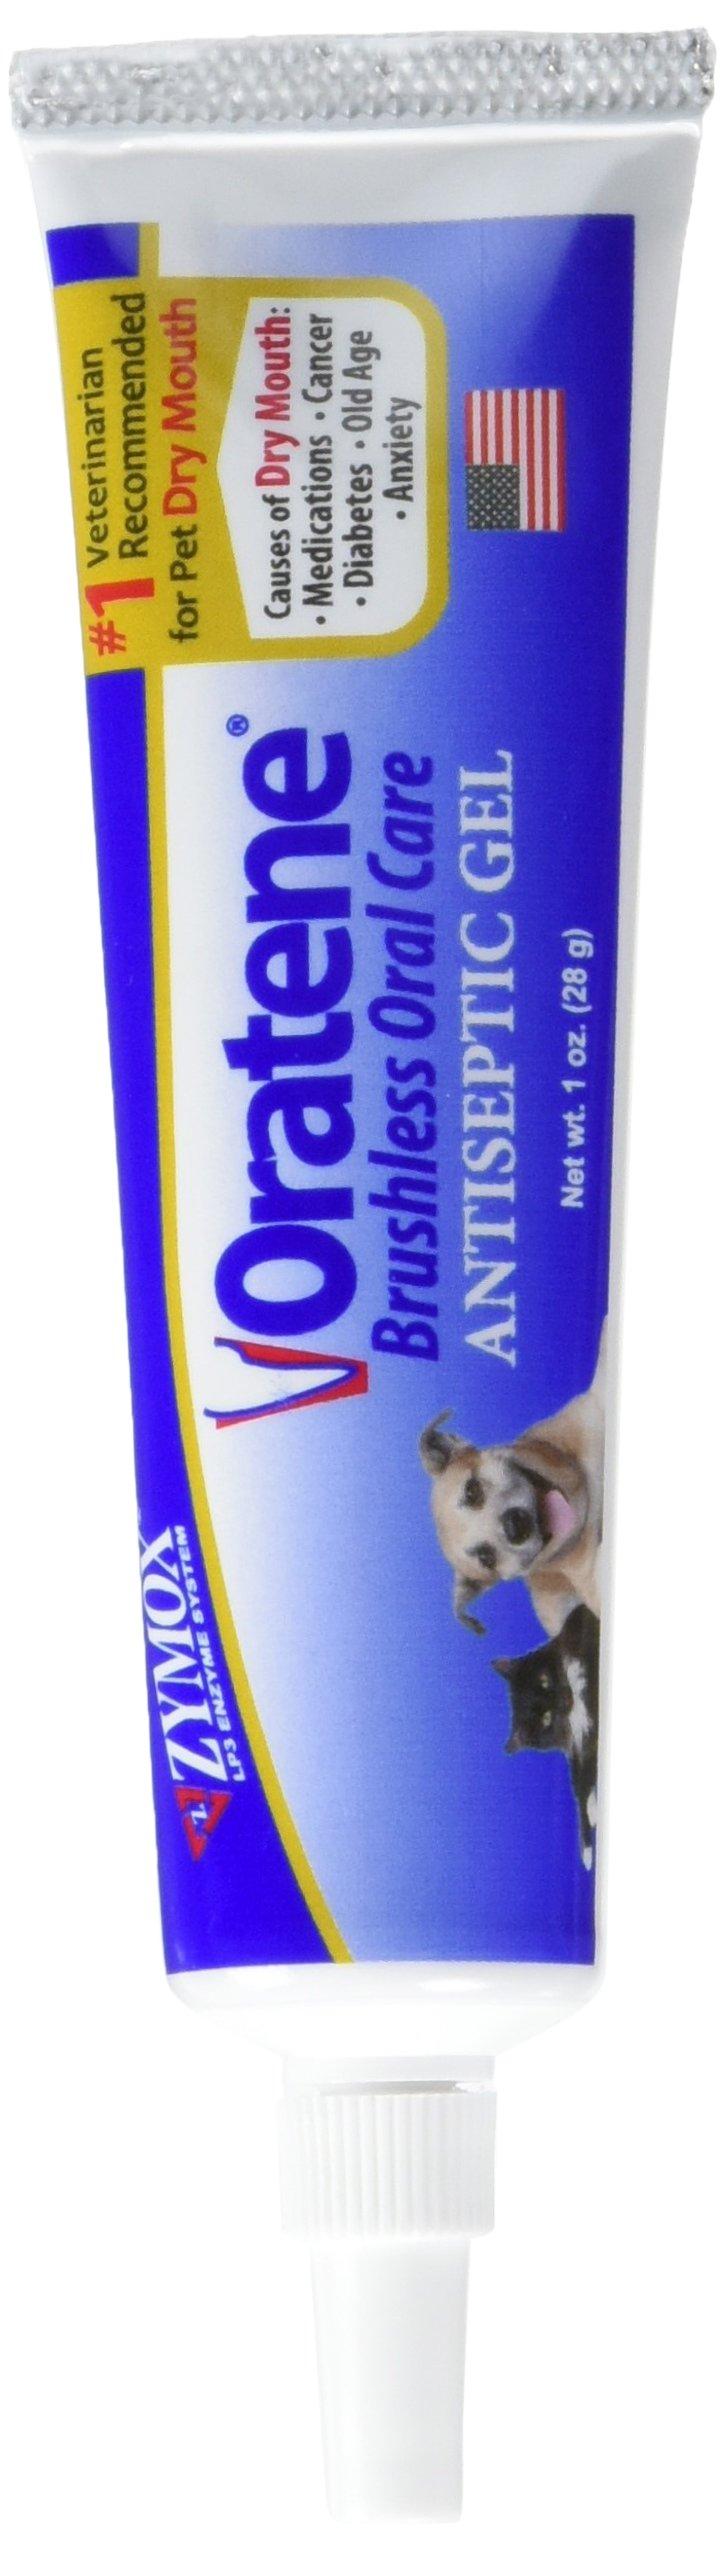 PET KING Oratene Veterinarian Antiseptic Oral Gel, 1.0 oz.